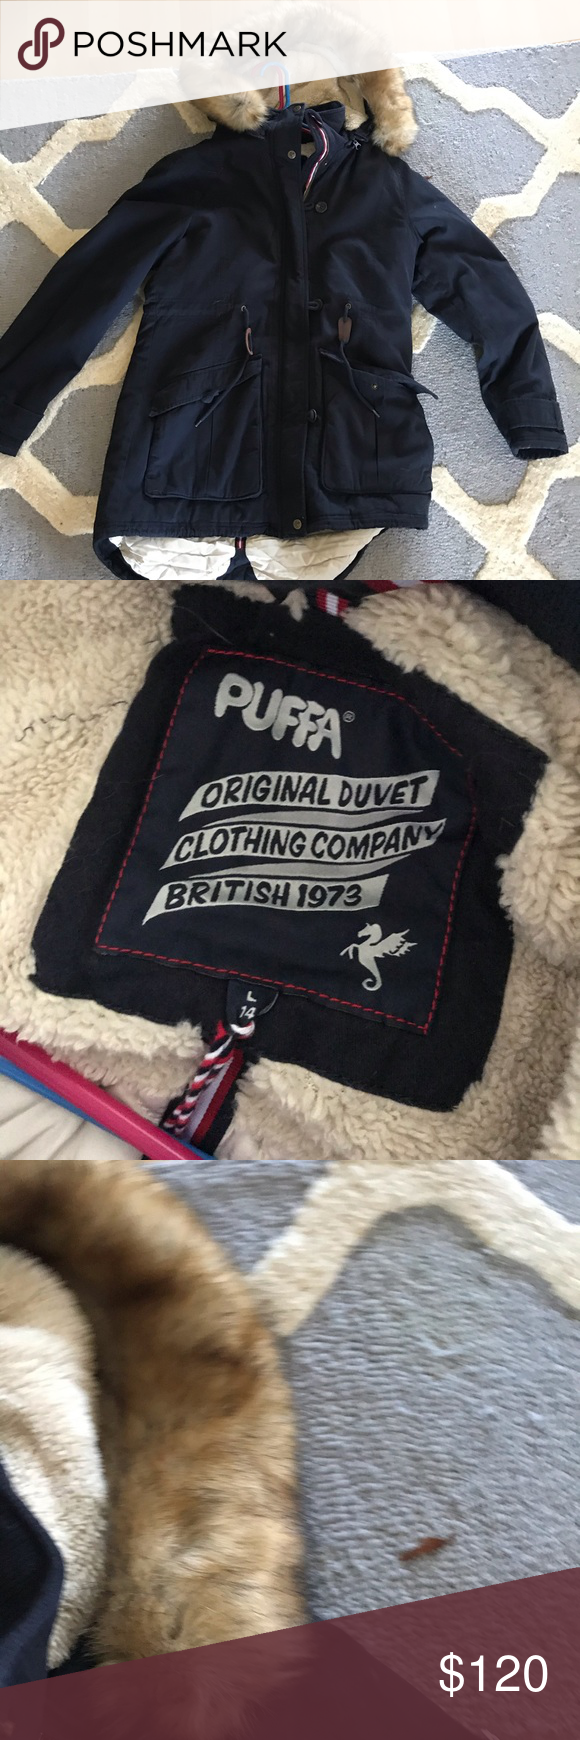 Puffa Jacket Brand New Normally 200 Jacket Brands Jackets Clothing Company [ 1740 x 580 Pixel ]